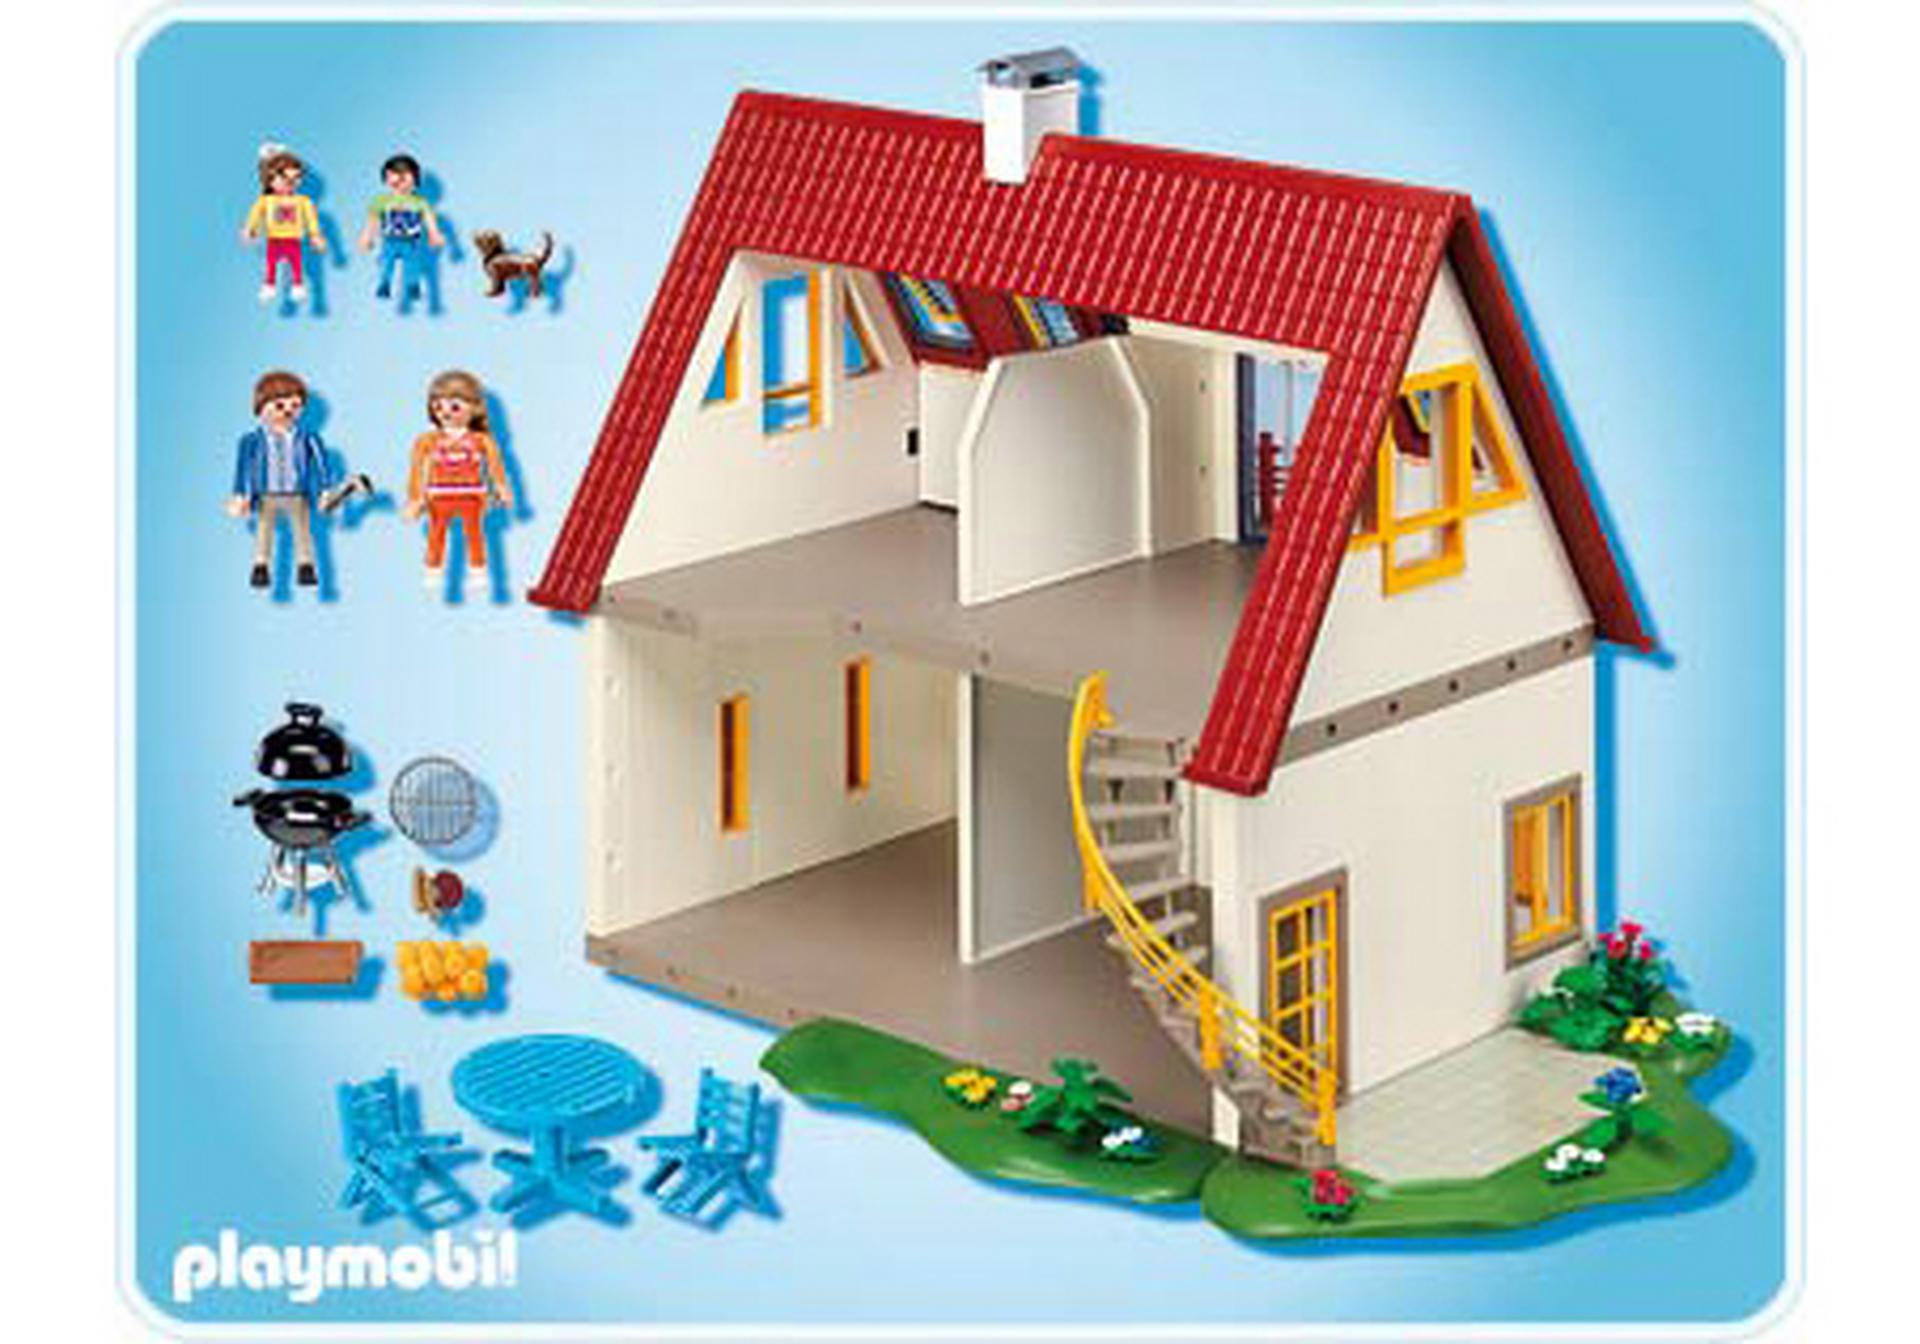 89 Modernes Haus Playmobil - playmobil special ...